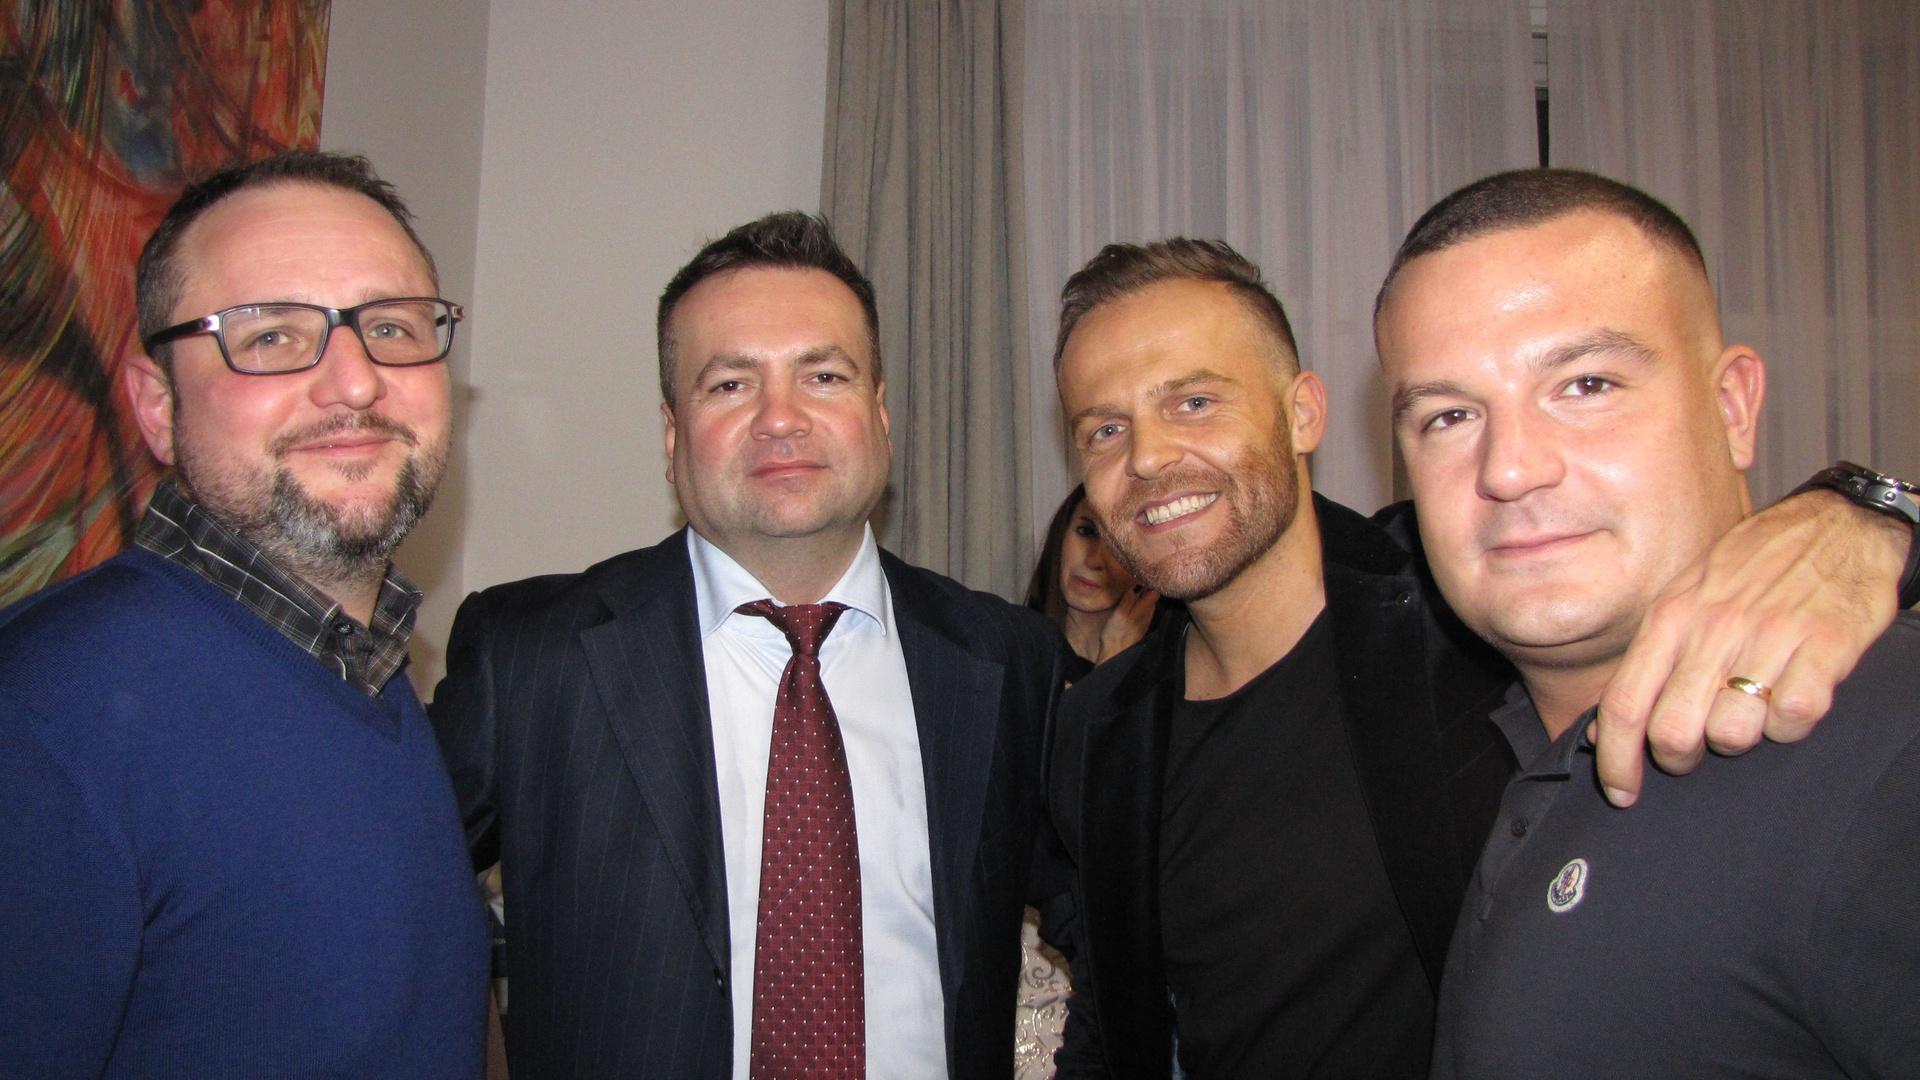 JUDr. Tomáš Mádl s přáteli